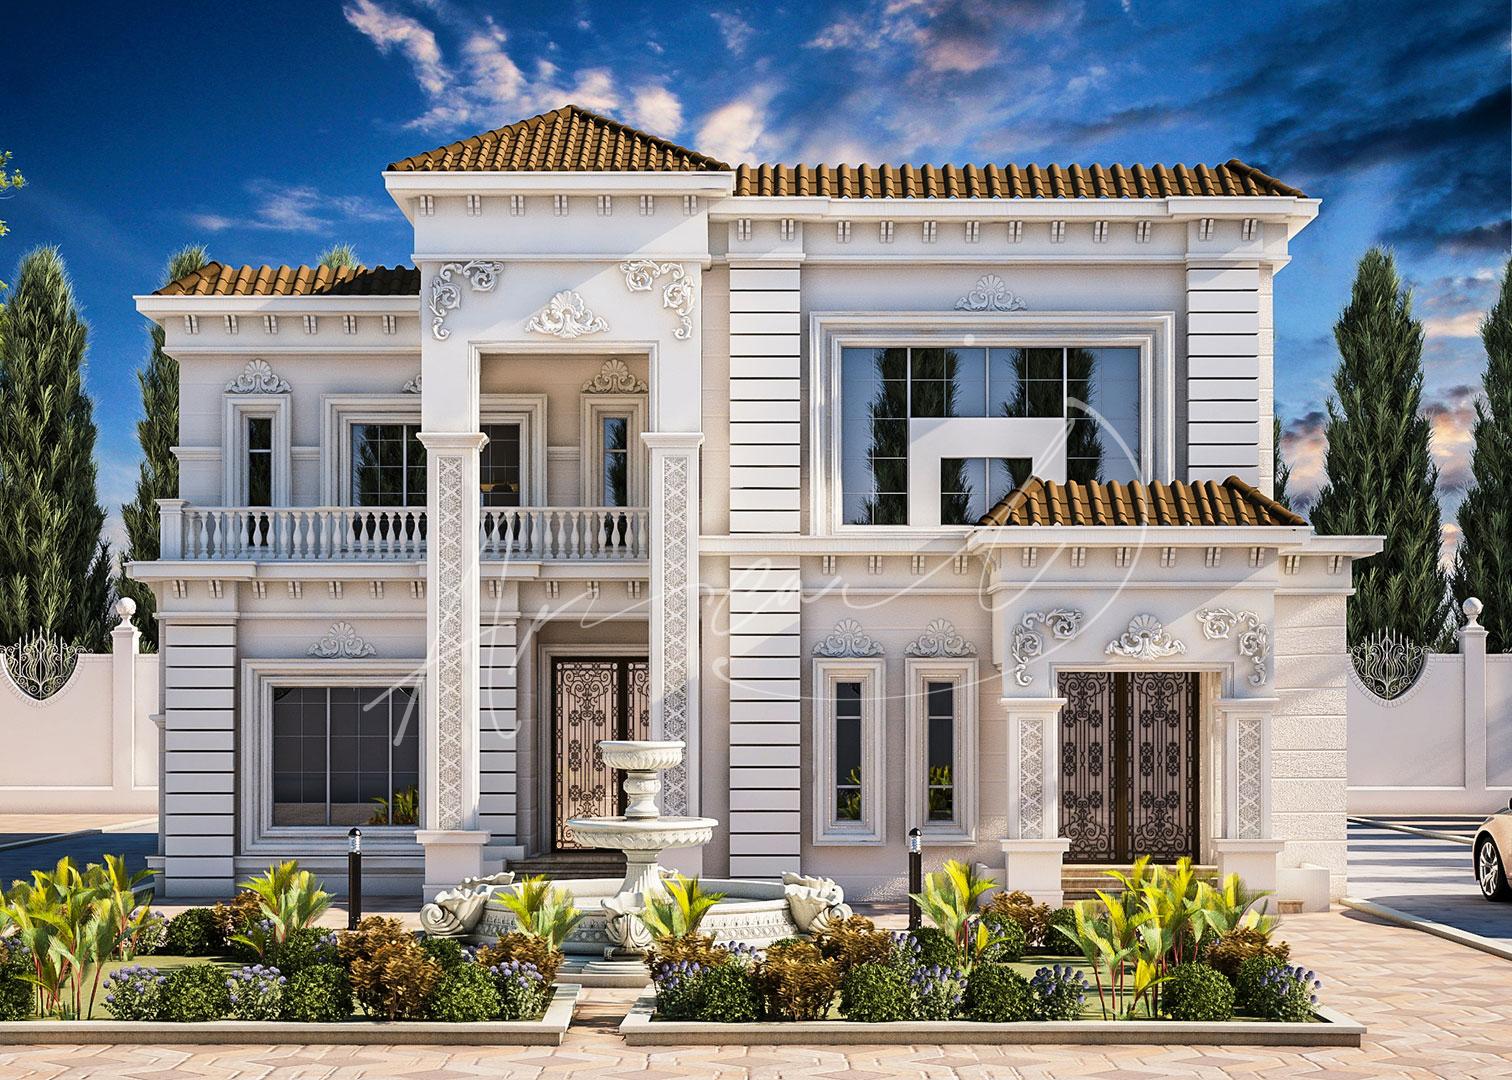 Luxury Neoclassical Villa Design - 041